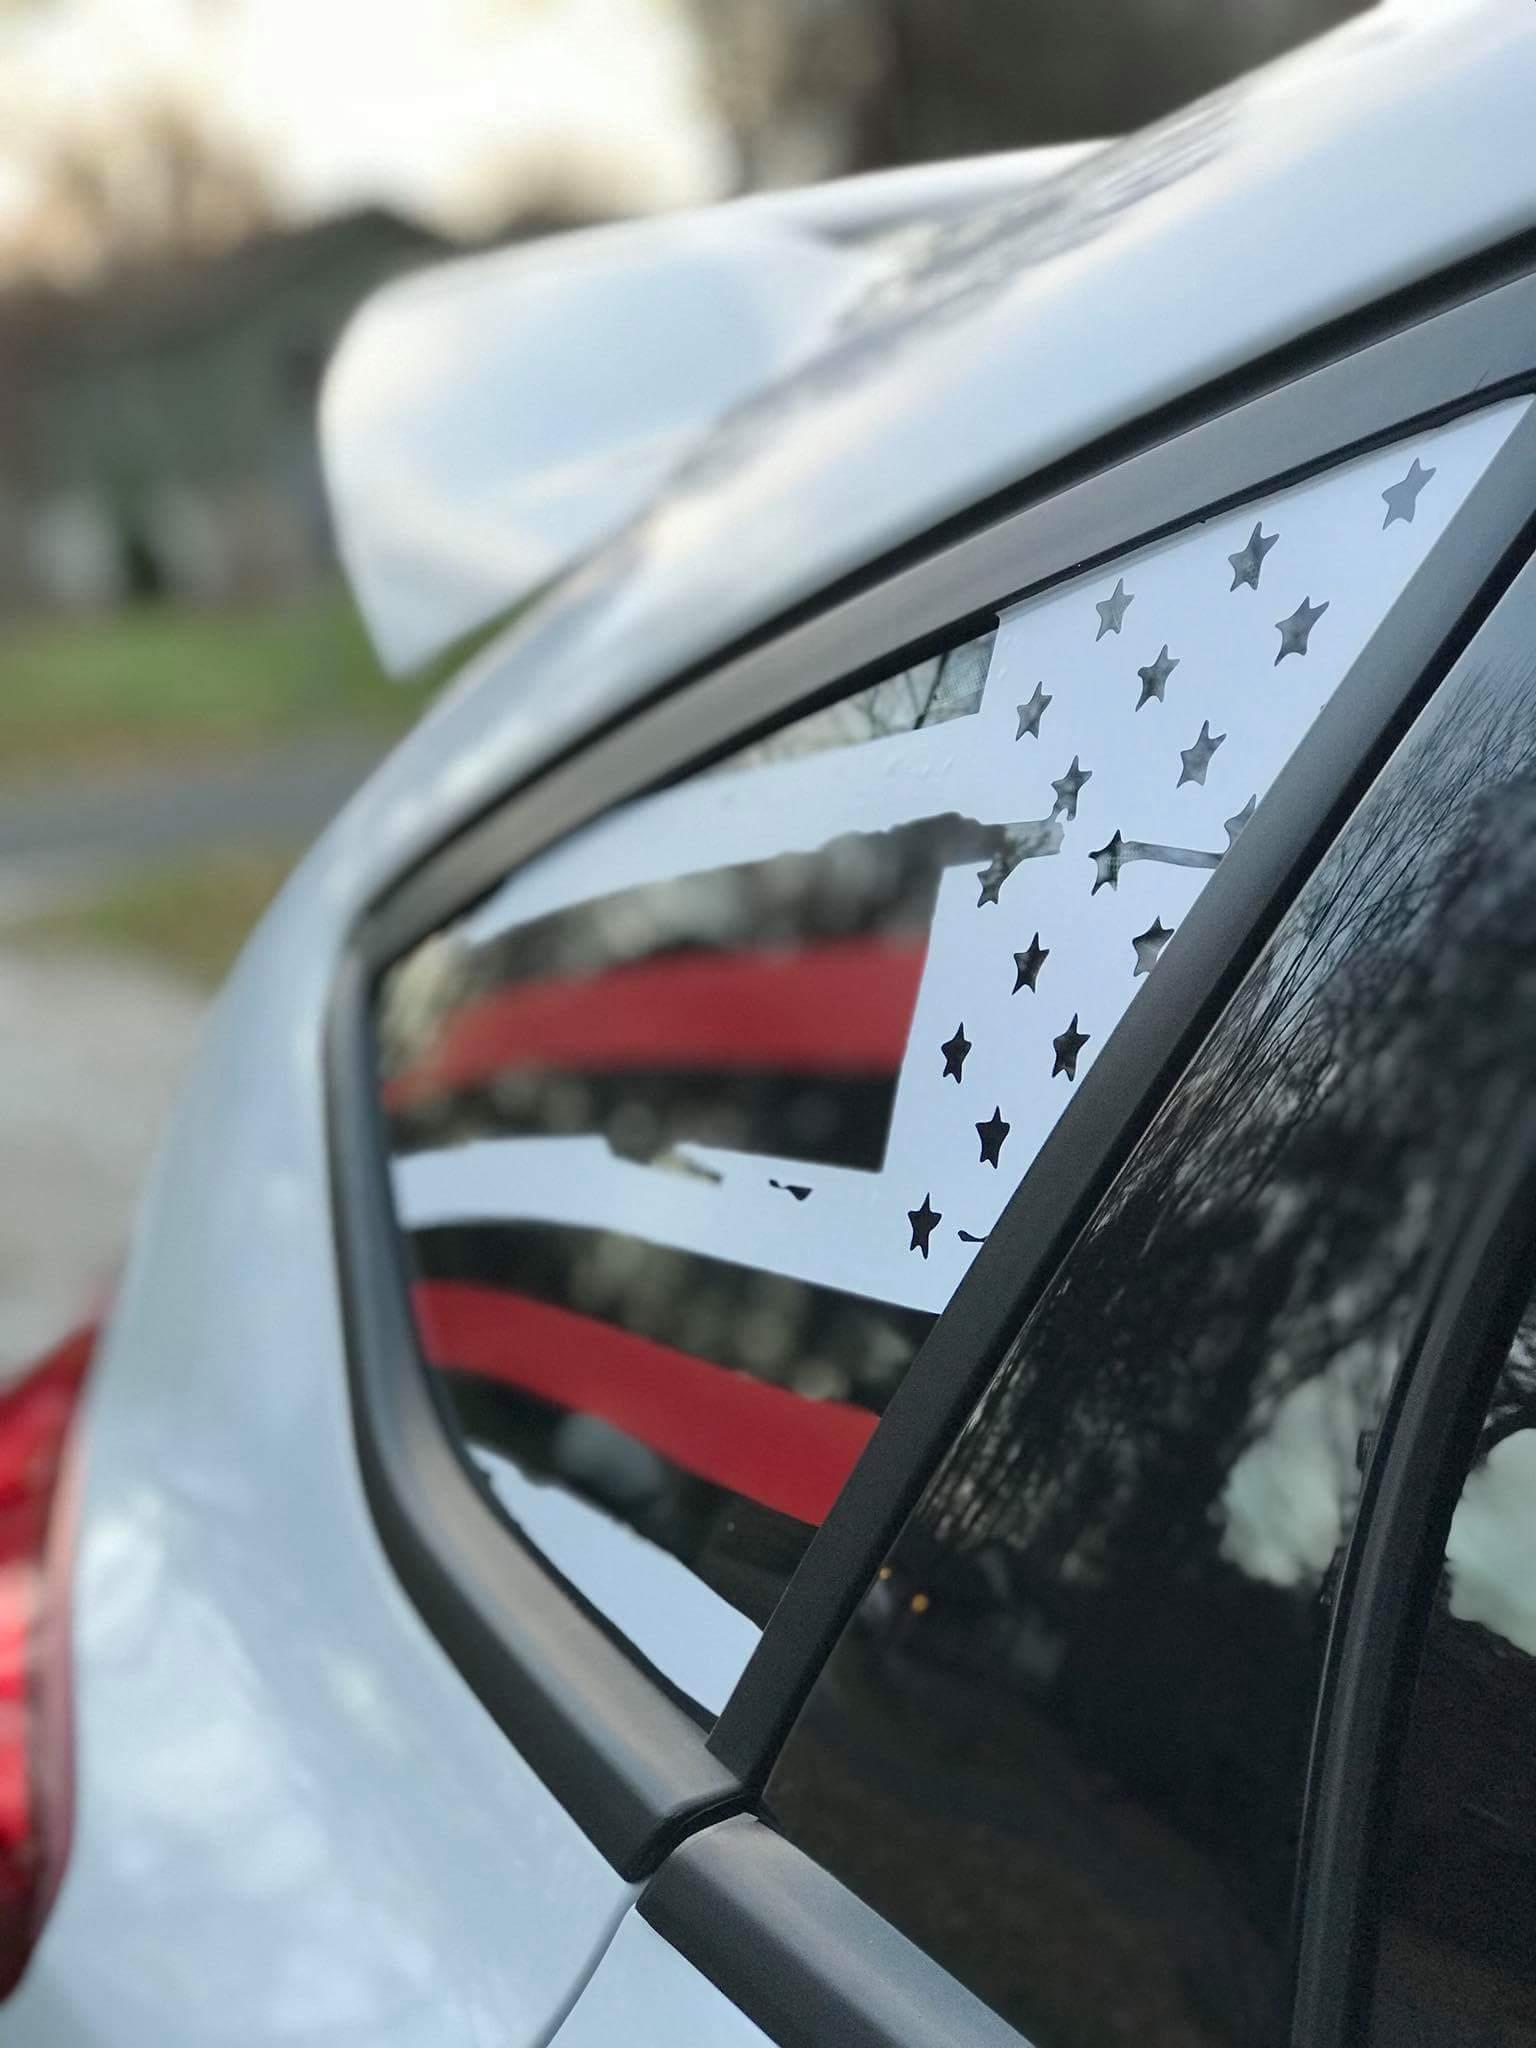 Ford Focus Mk3 Rear Window Decals